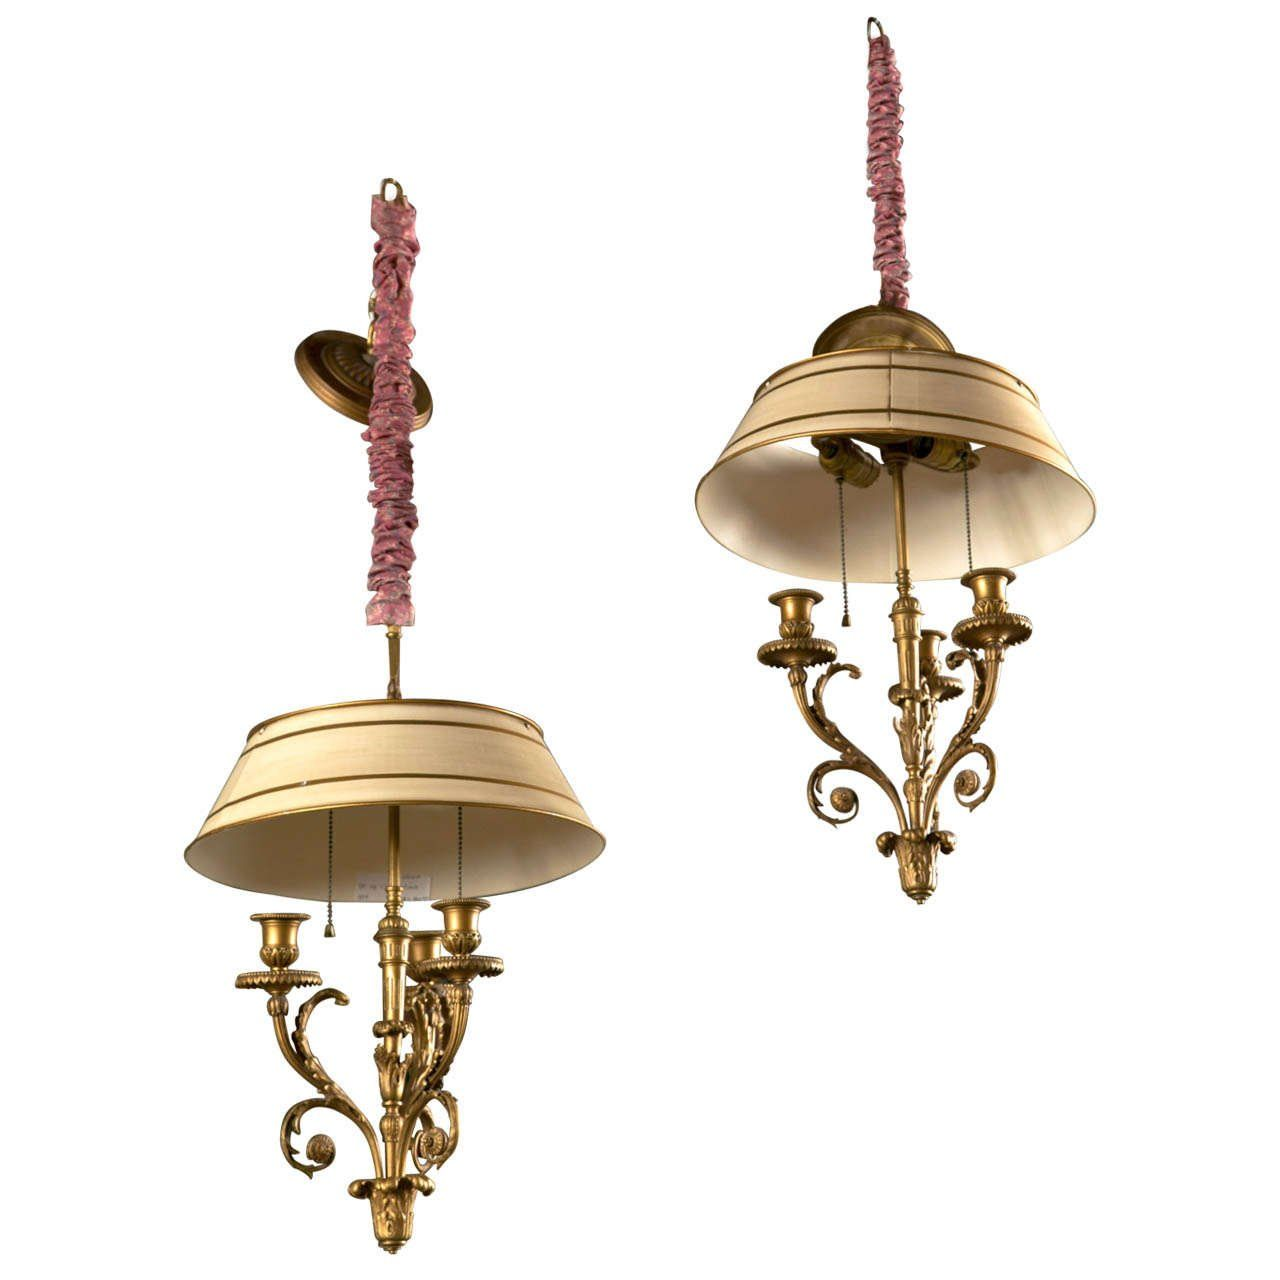 Pair of Bronze Doré Louis XV Style Chandeliers   1stdibs.com